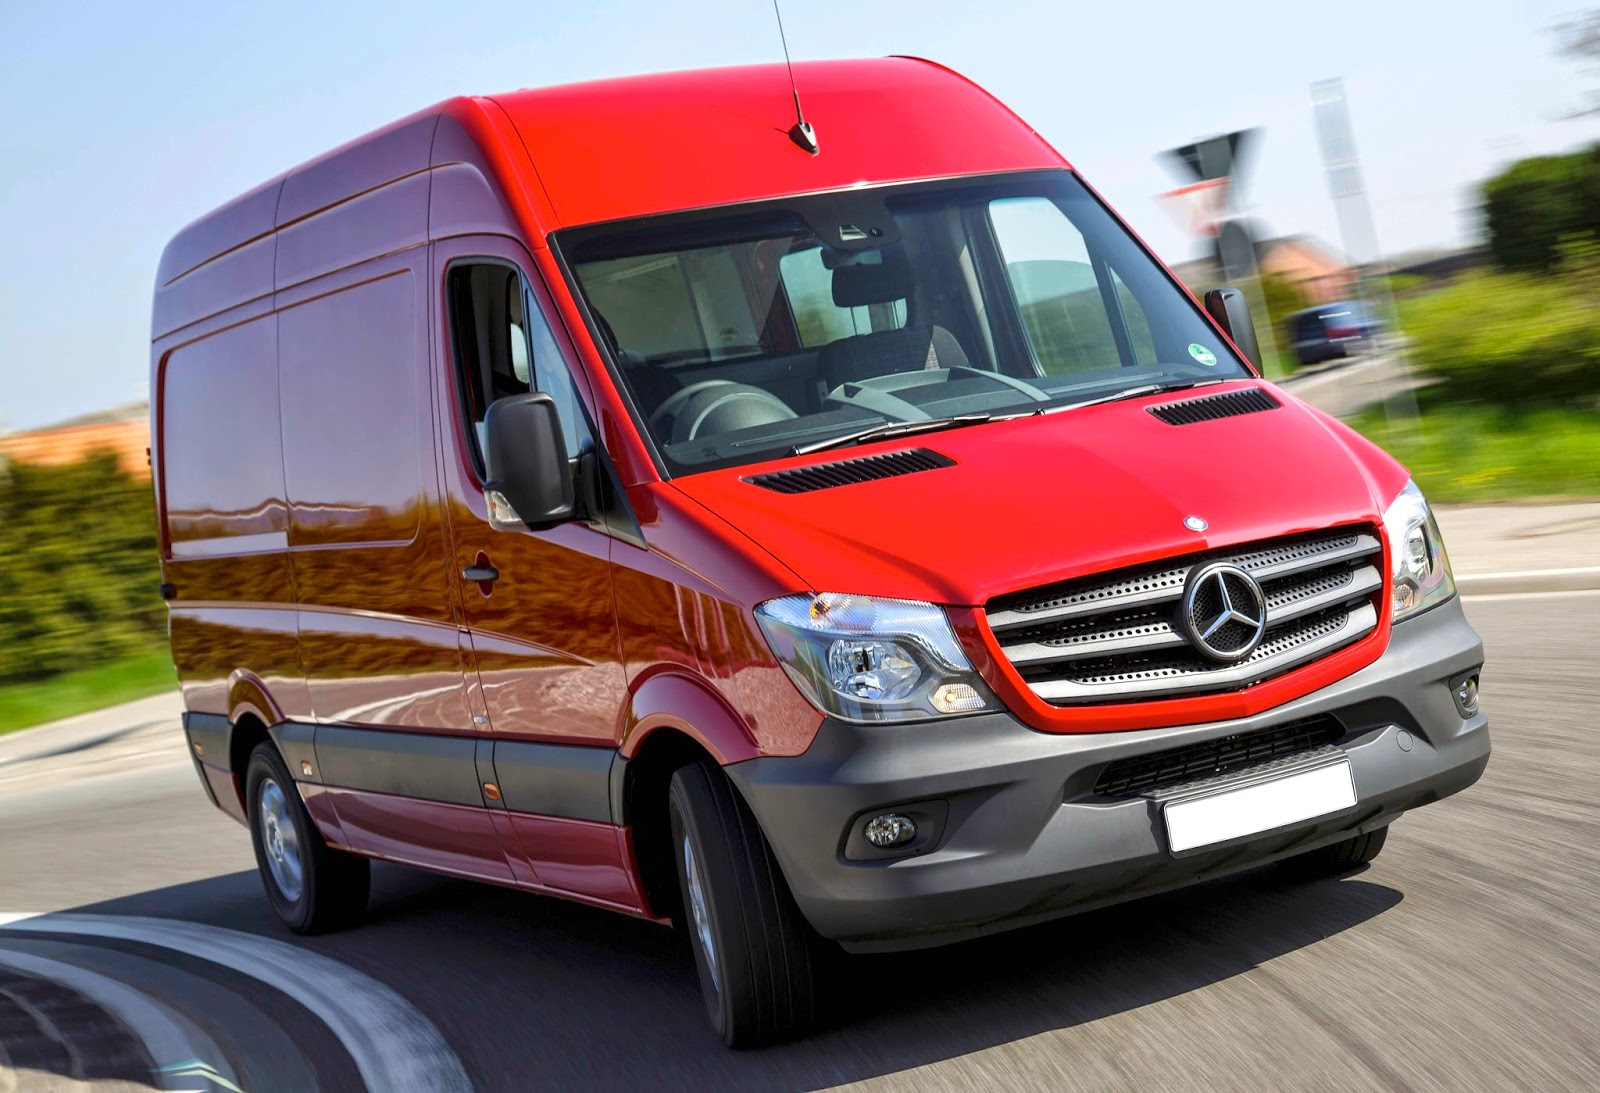 Irish car travel magazine mercedes benz appoints new for Star motors mercedes benz